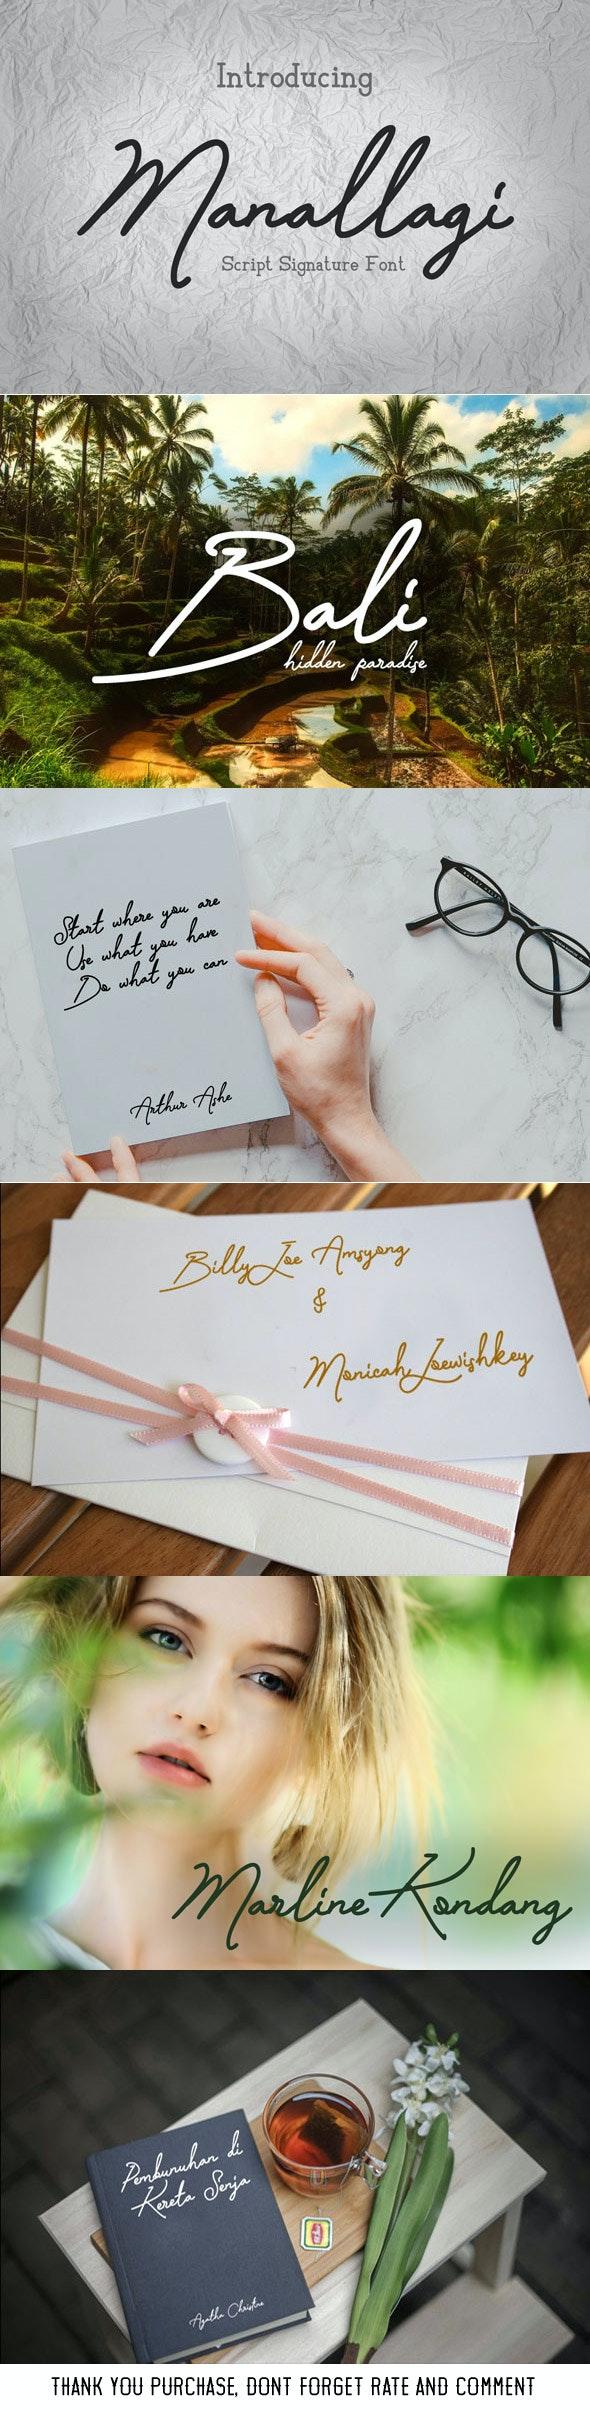 Manallagi - Script Handwritten Font - Hand-writing Script